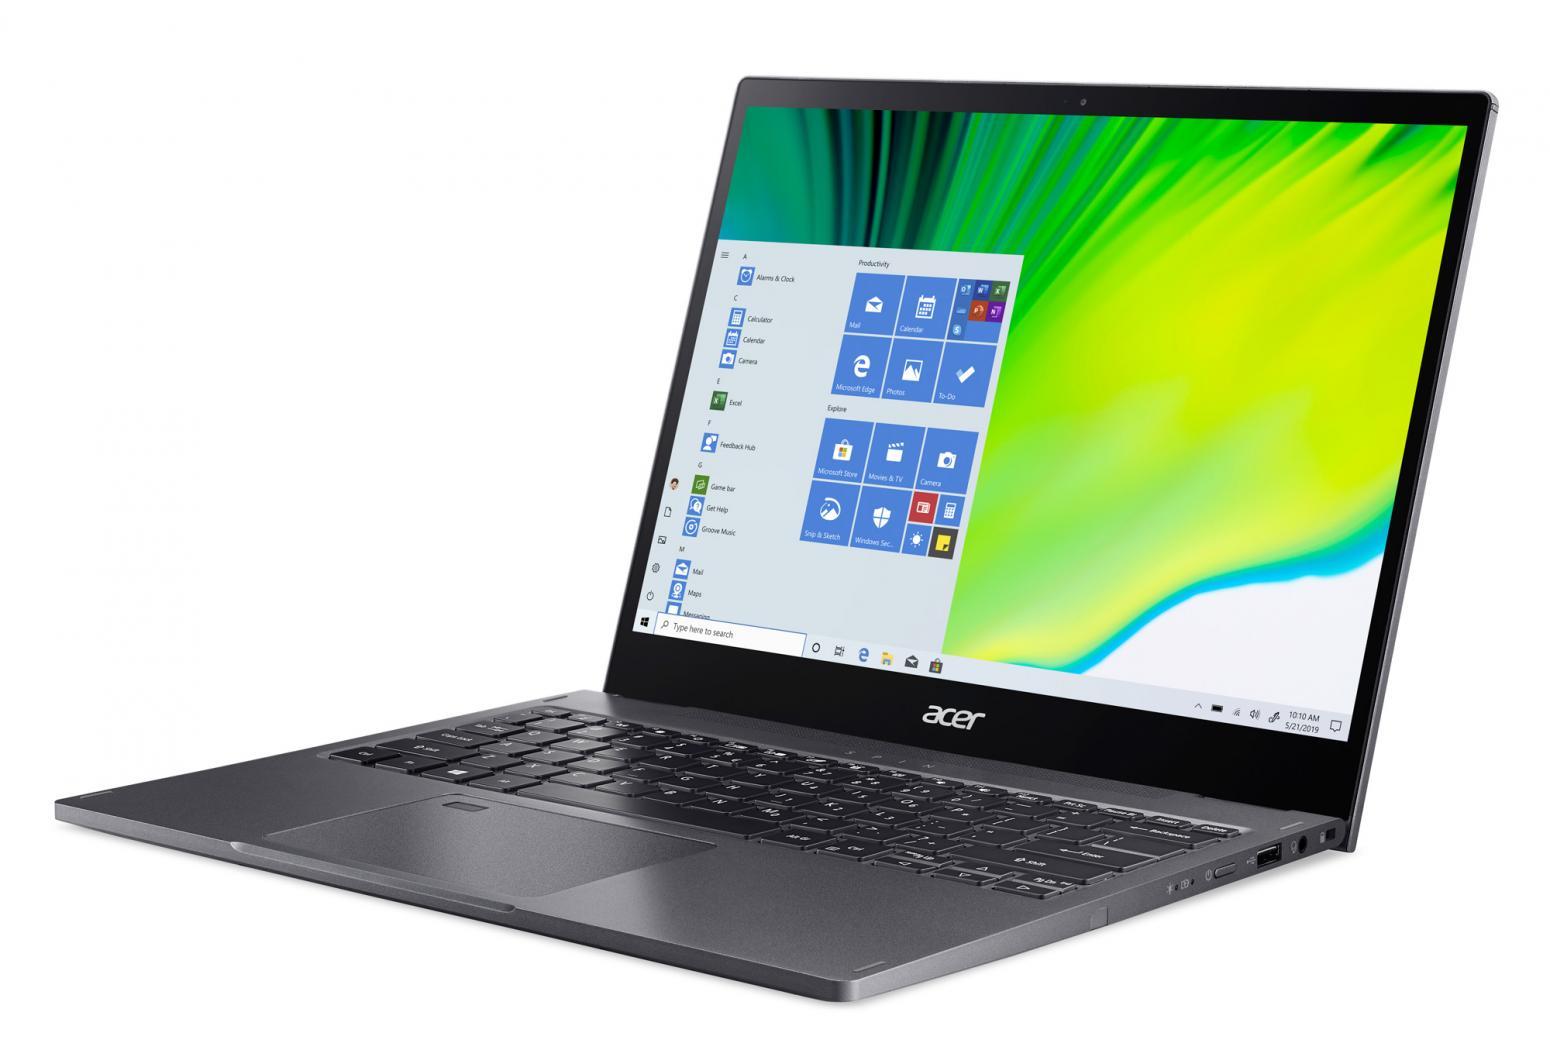 Ordinateur portable Acer Spin 5 SP513-54N-59ED Gris - QHD Tactile, Stylet - photo 5